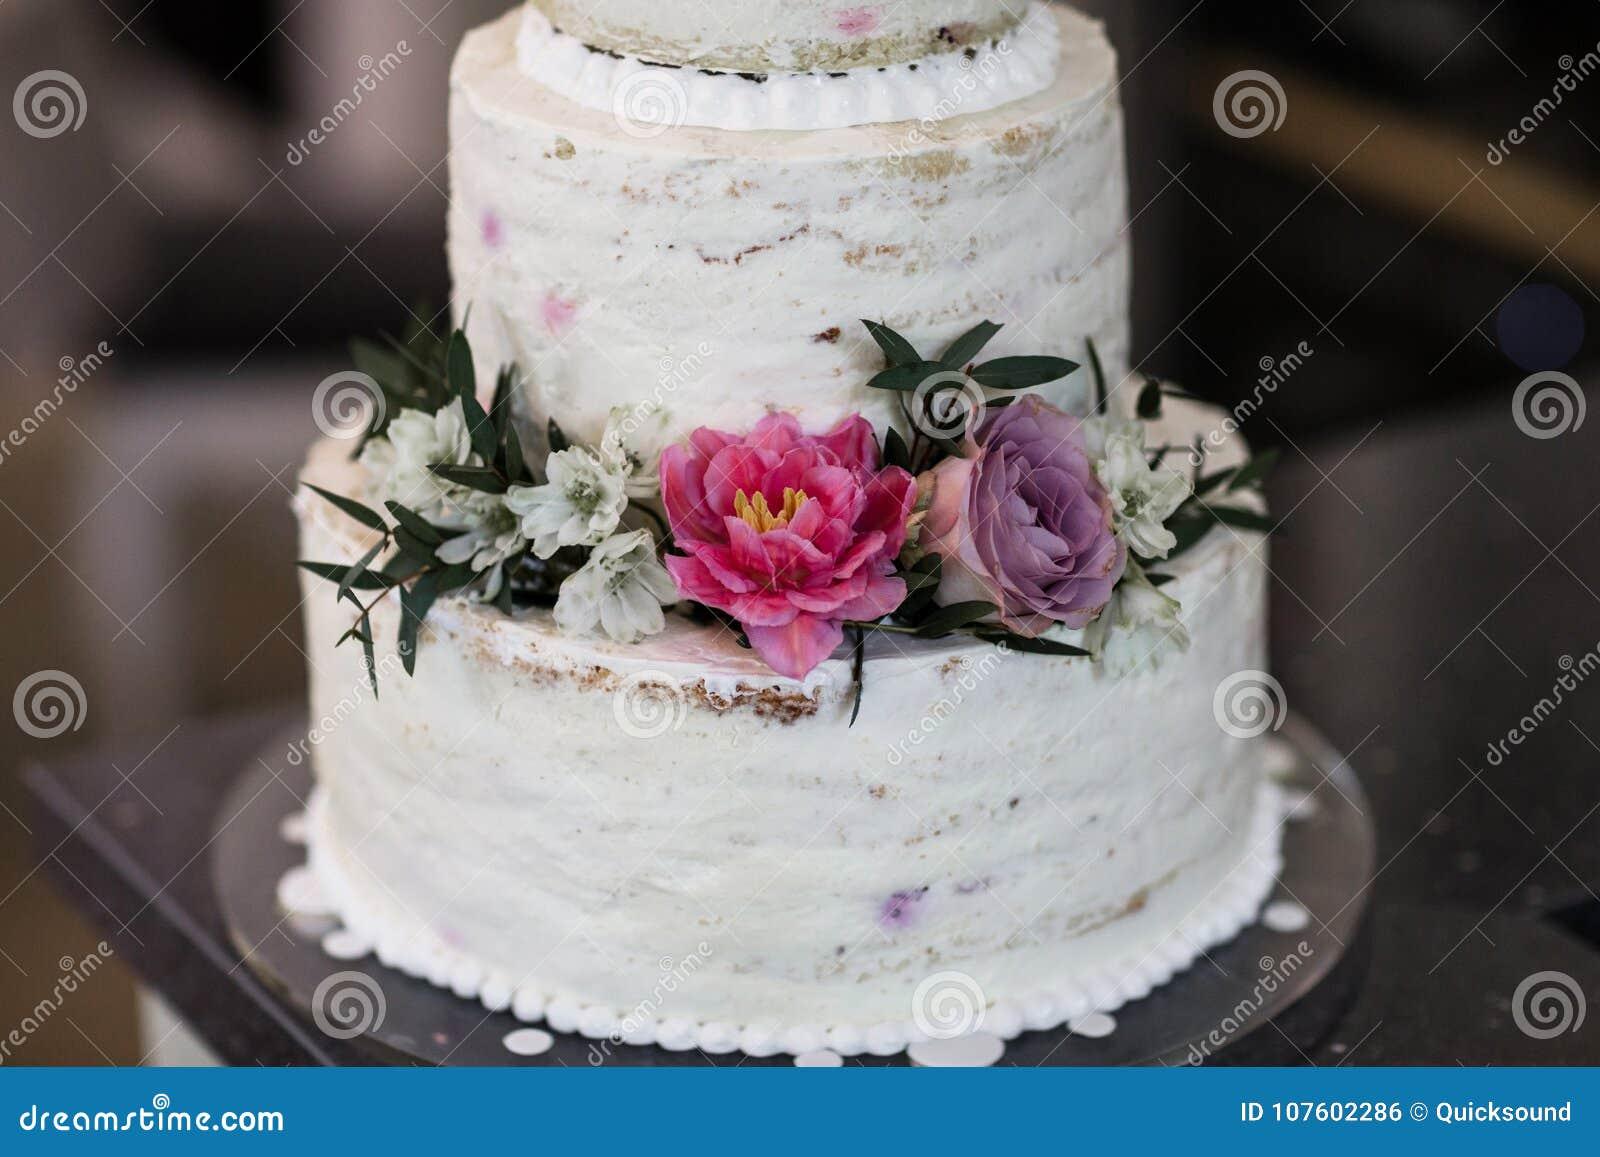 Wedding Cake Decorated With Fresh Flowers Stock Photo Image Of